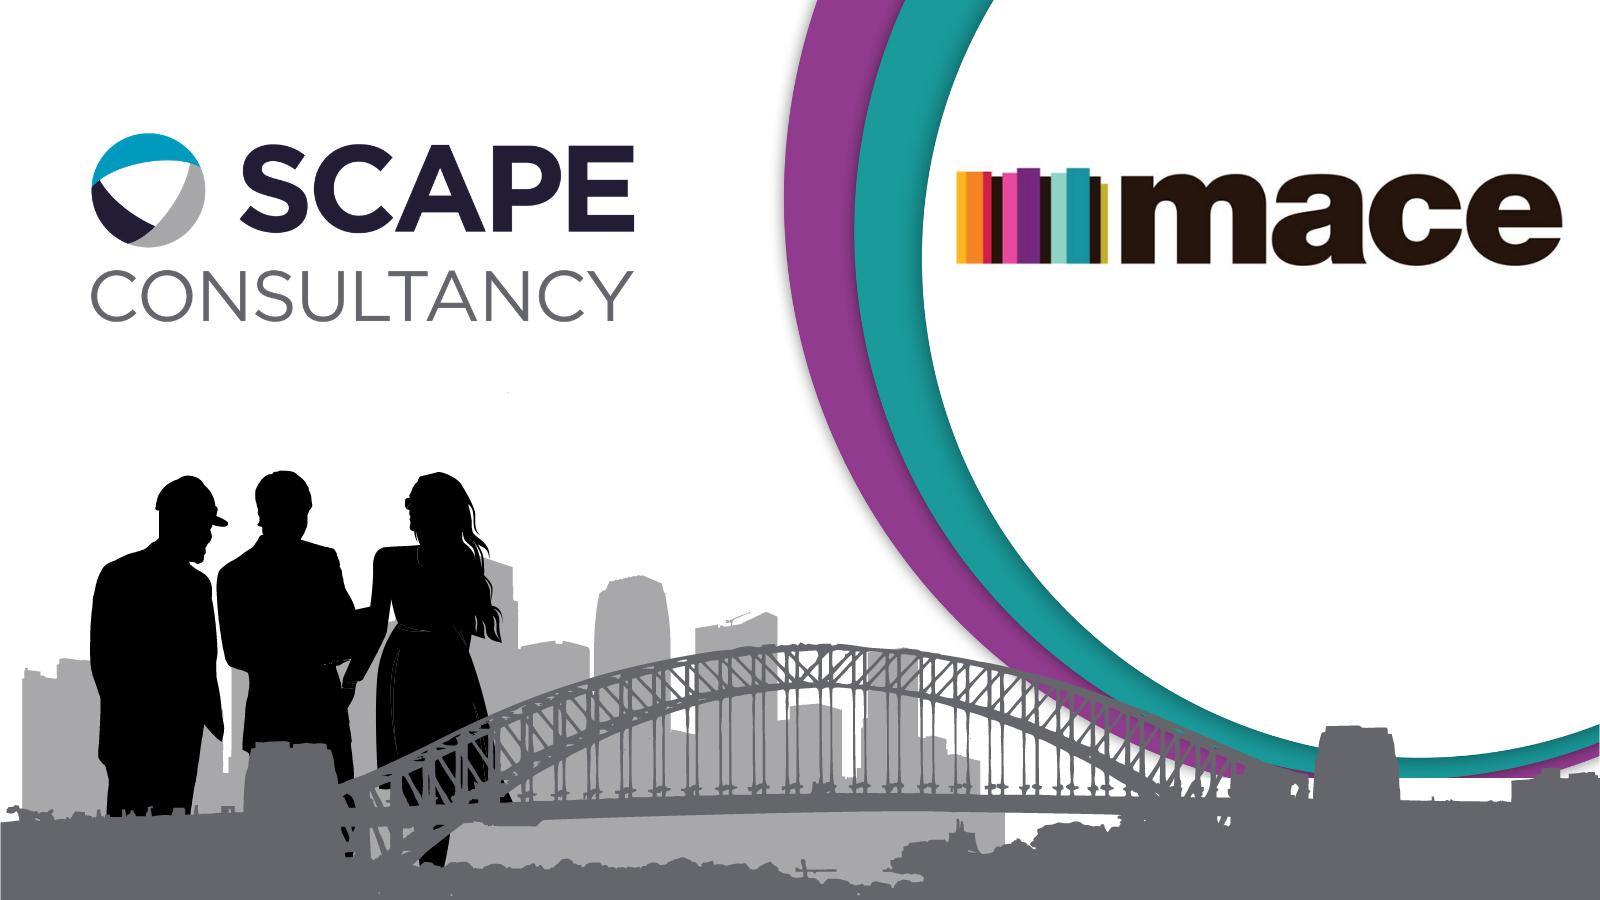 Scape Consultancy Partnership Logo - Mace Group